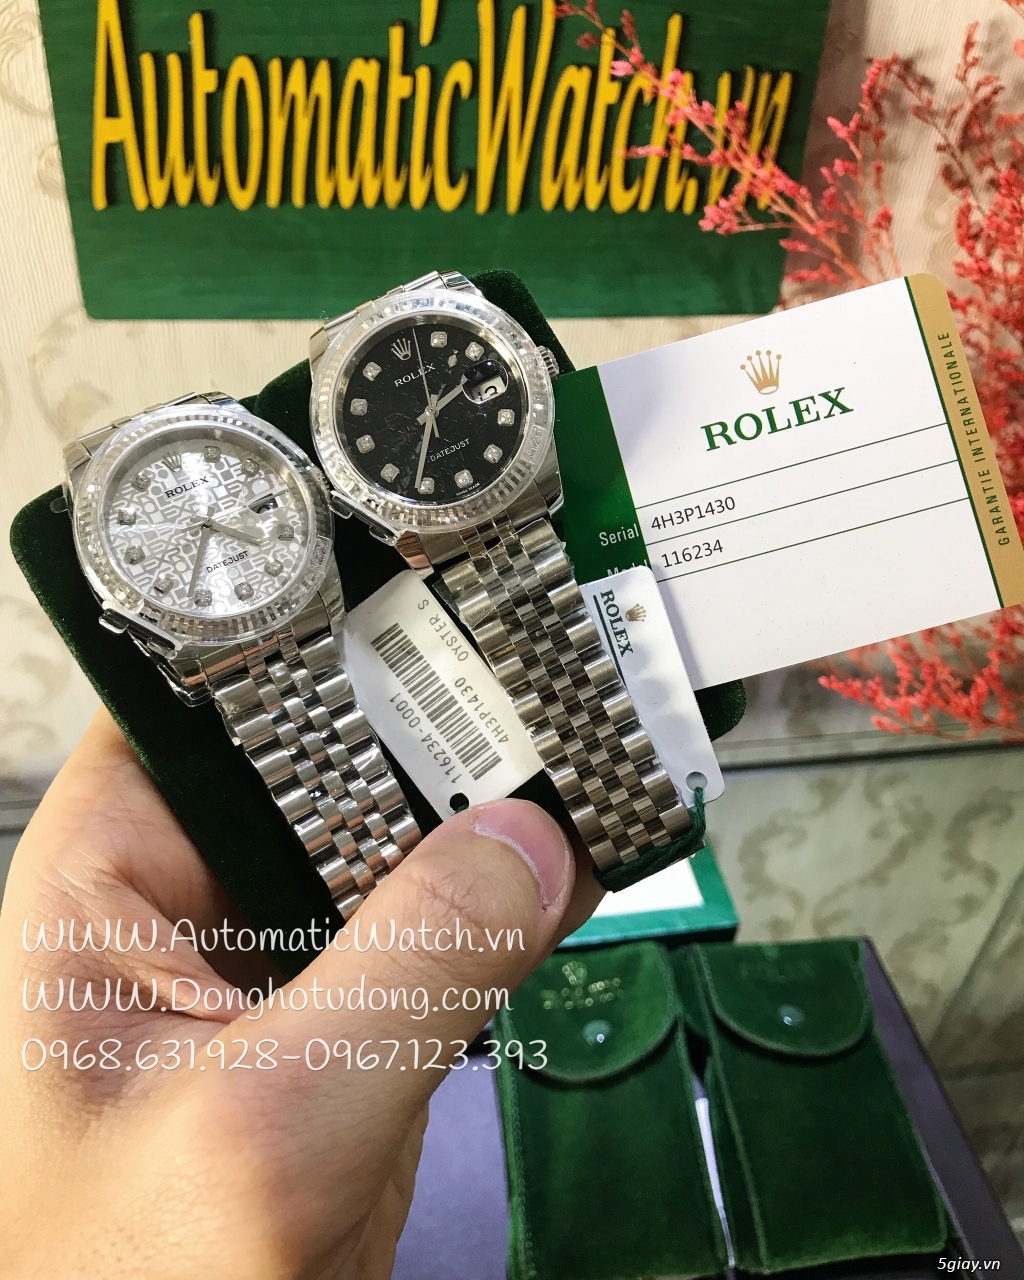 Chuyên đồng hồ Rolex,Hublot,AP, Patek Philippe...Replica1:1 Swiss Made - 33